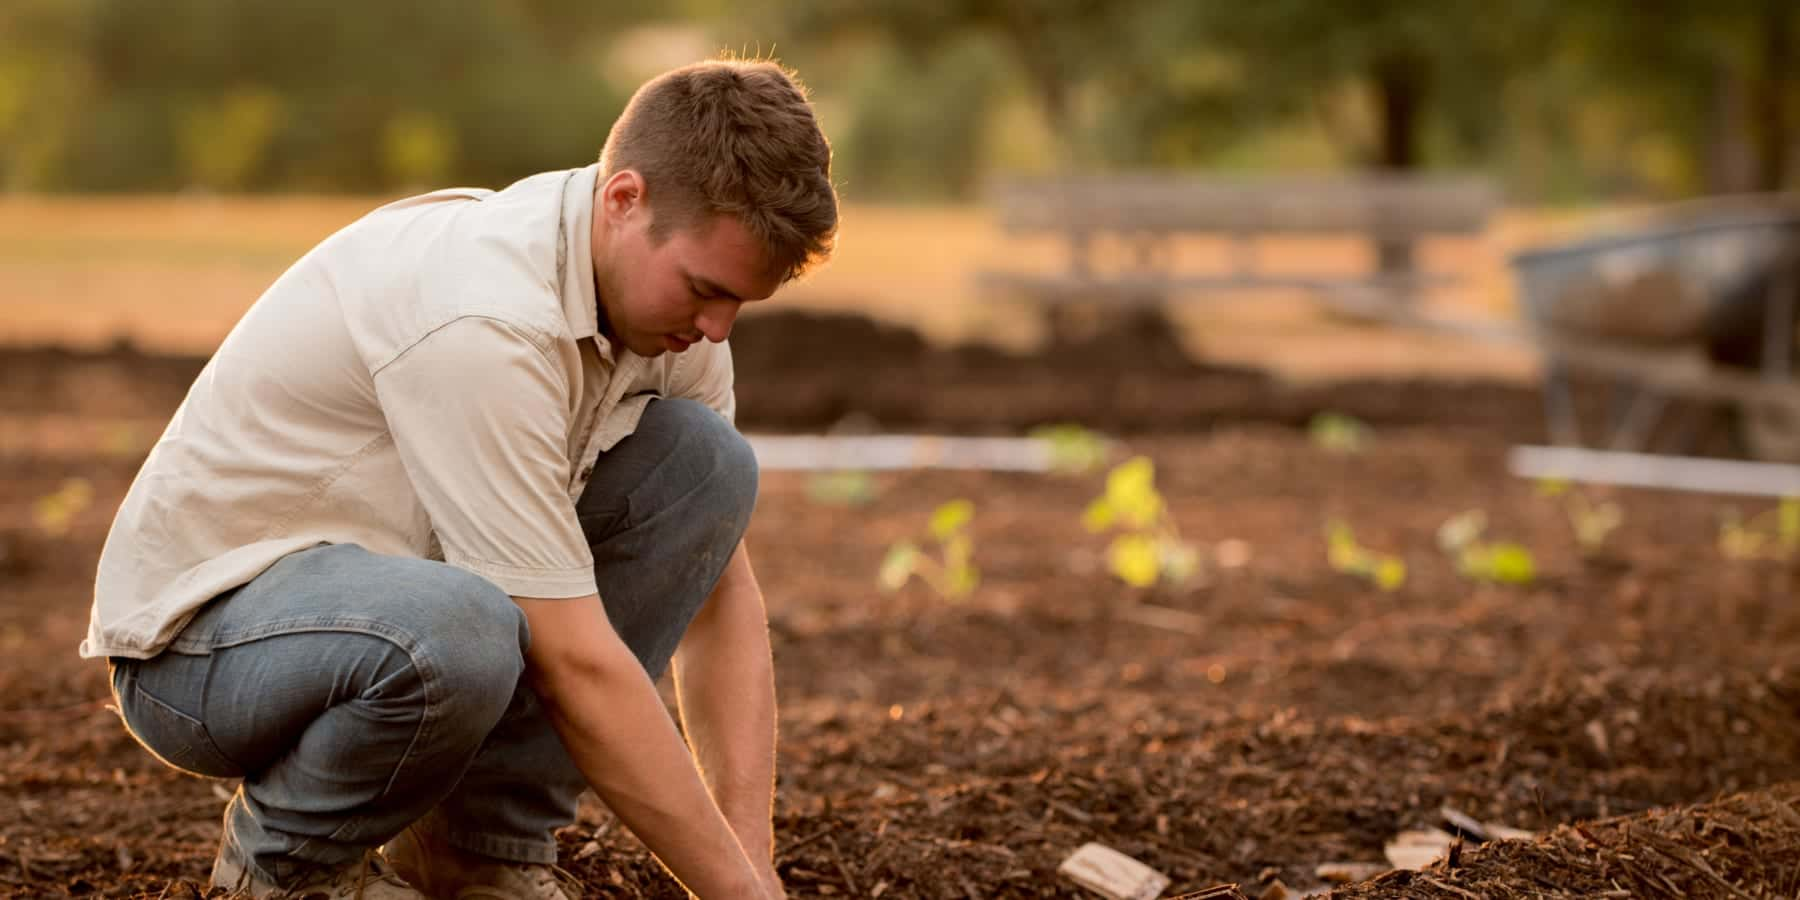 WWFが開始した、食品事業者向けの準備いらずな堆肥化サブスク